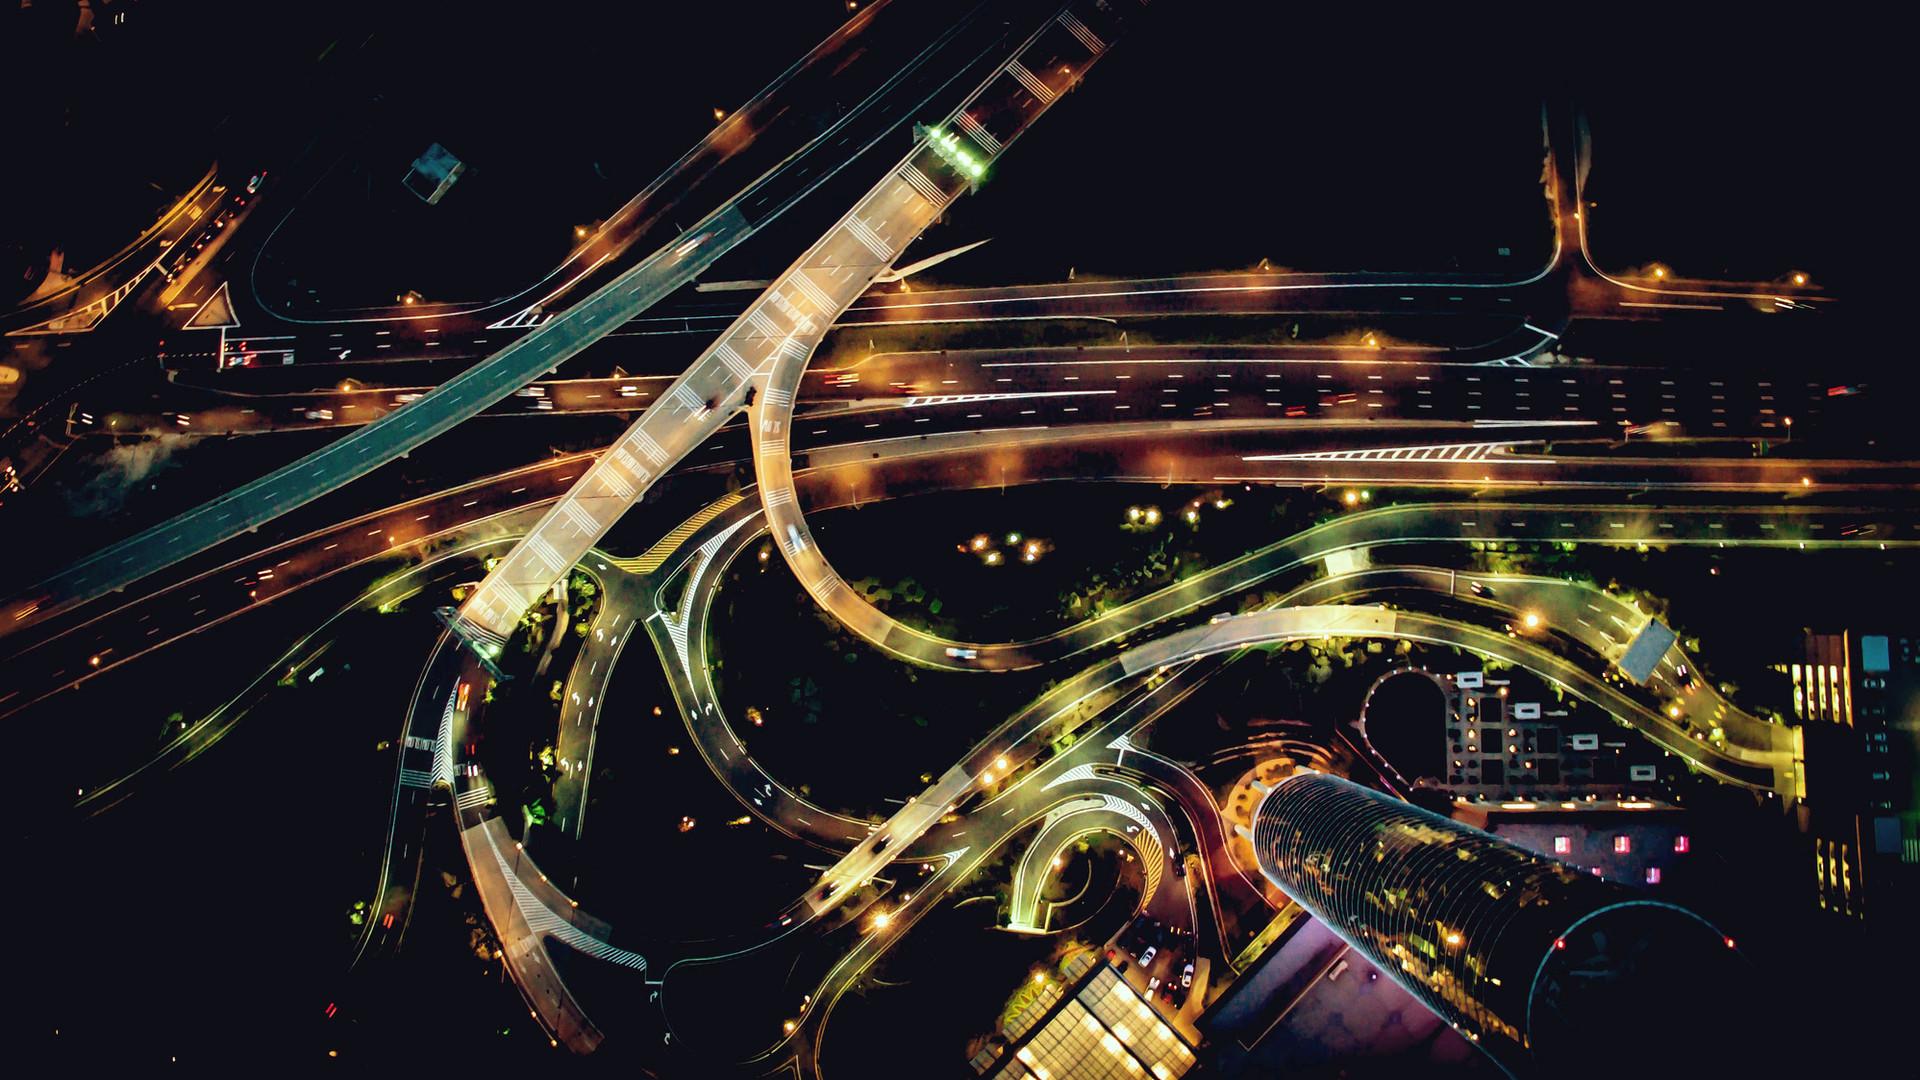 Nightimt aerial view of road junction